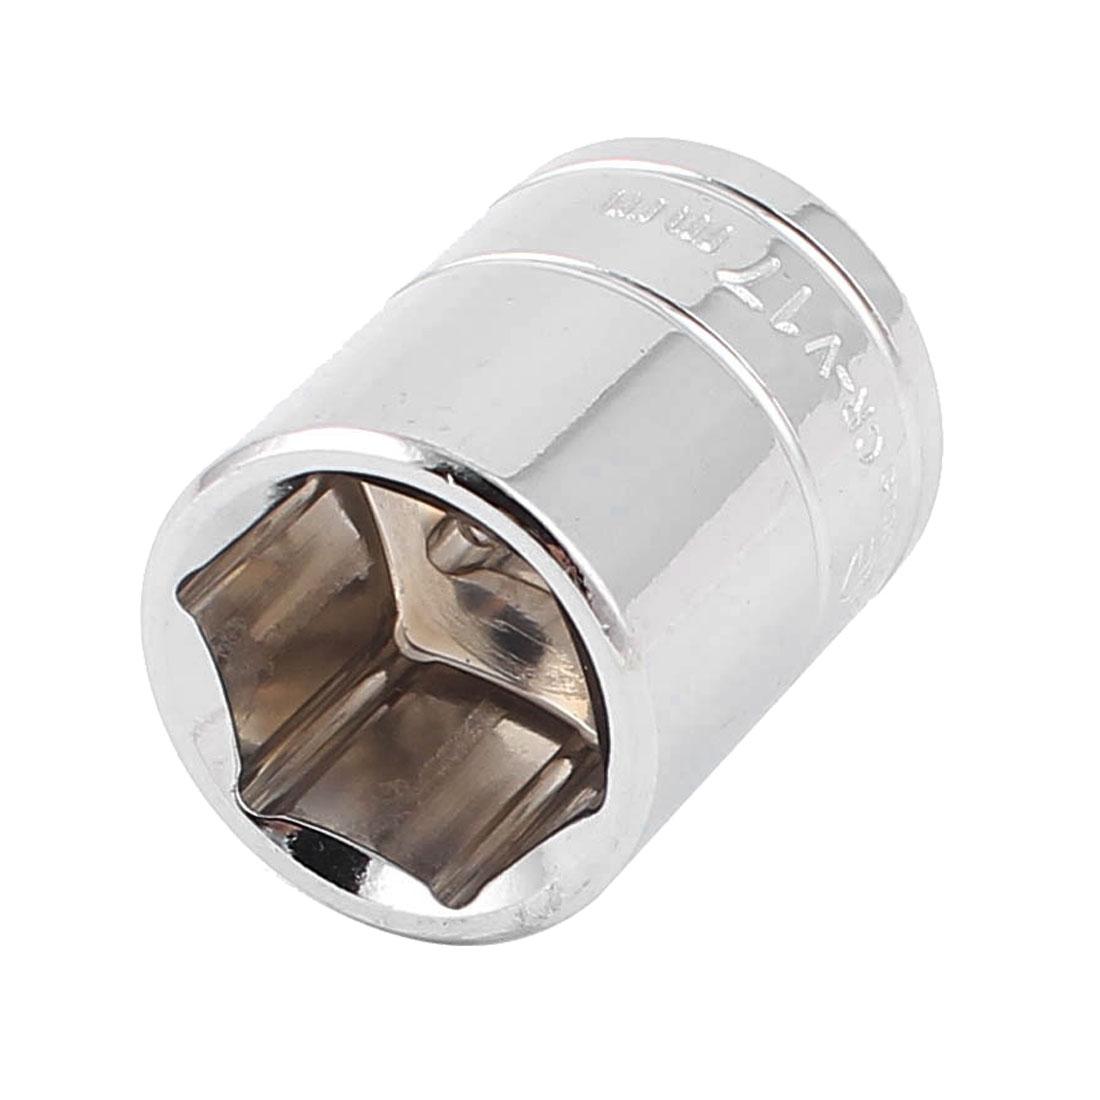 "3/8"" Drive Chrome-vanadium Steel Metric 6 Point Axle Nut Hex Socket 17mm"